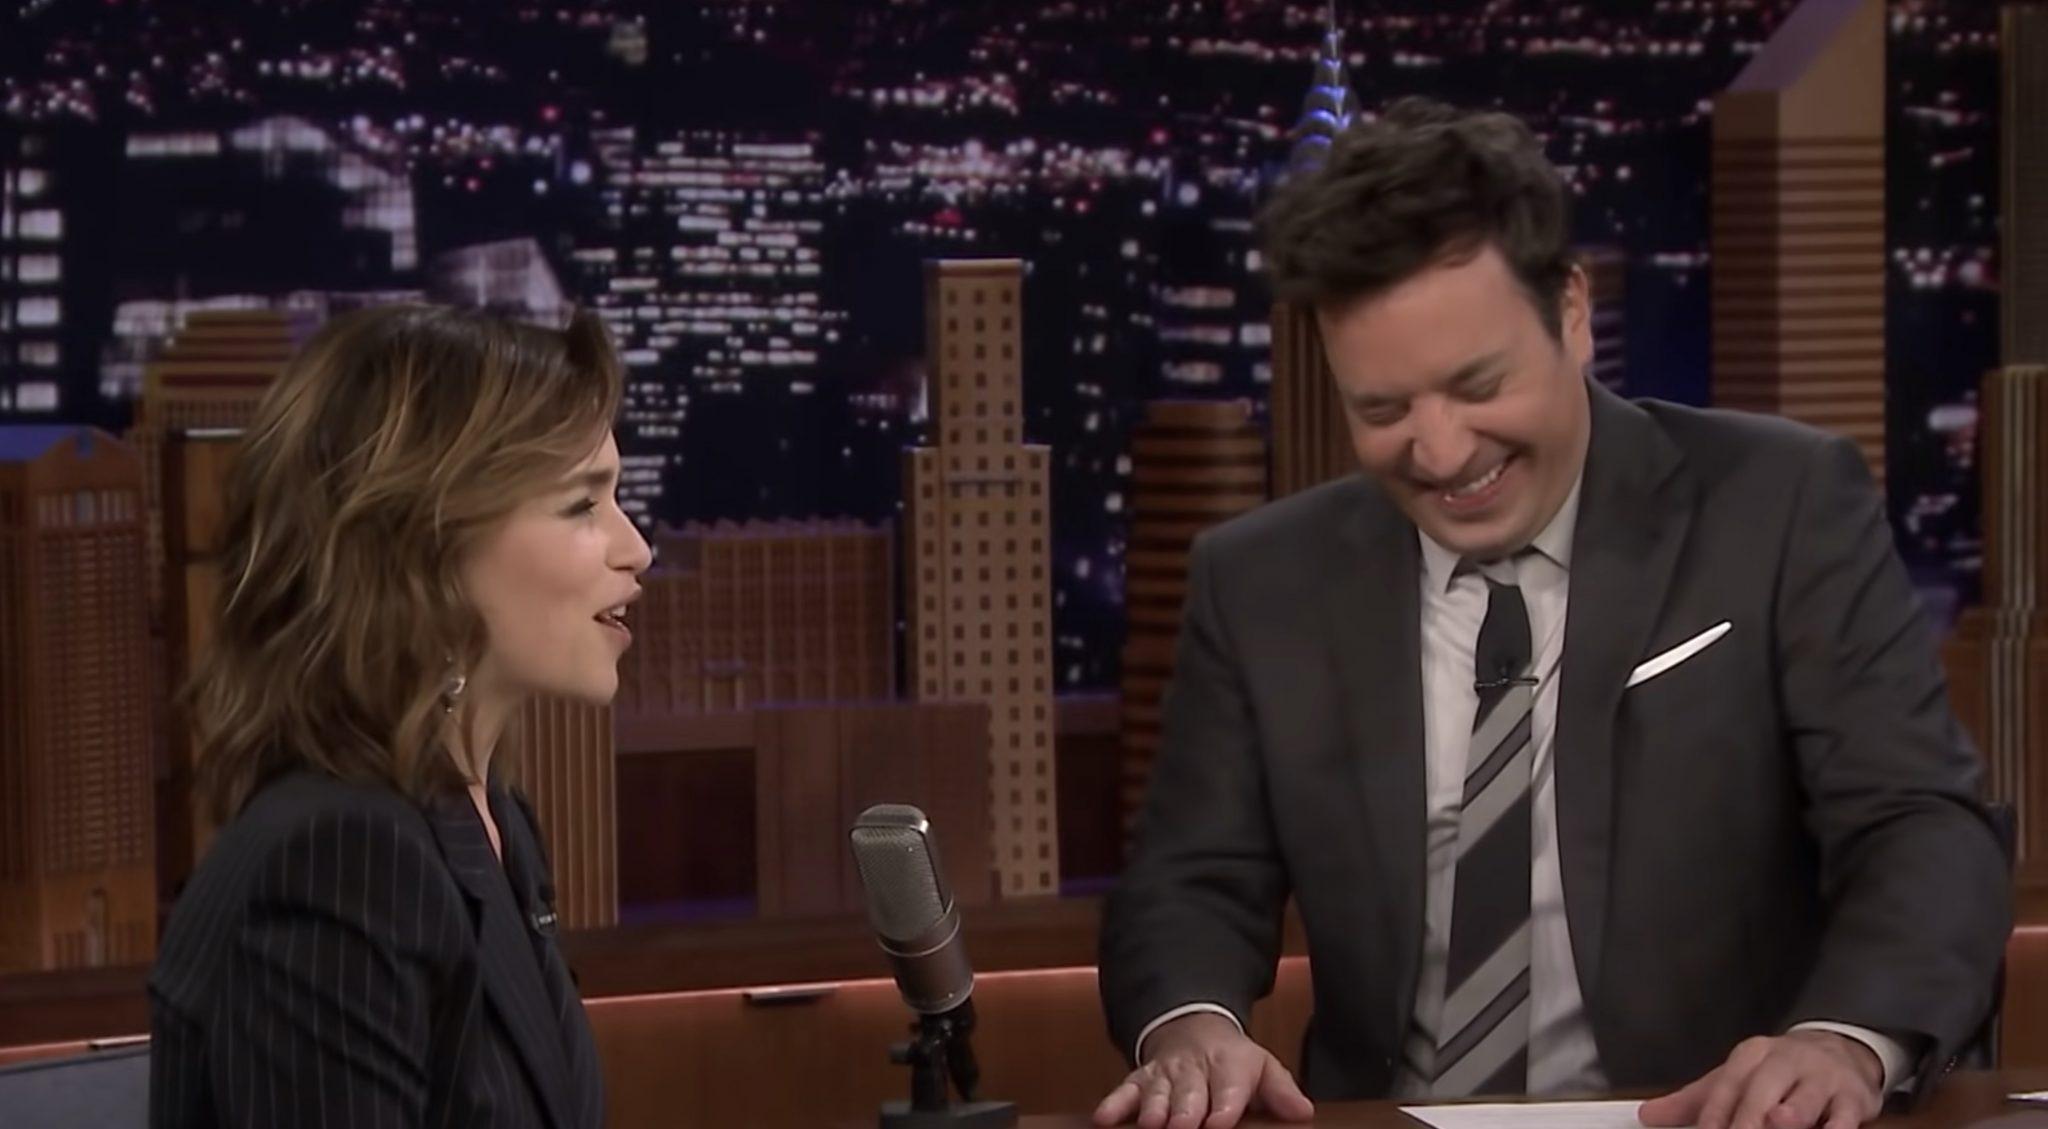 Got Emilia Clarke, Jimmy Fallon Discuss Game of Thrones Coffeegatehttps://www.youtube.com/watch?v=R5oYt_J9OJE